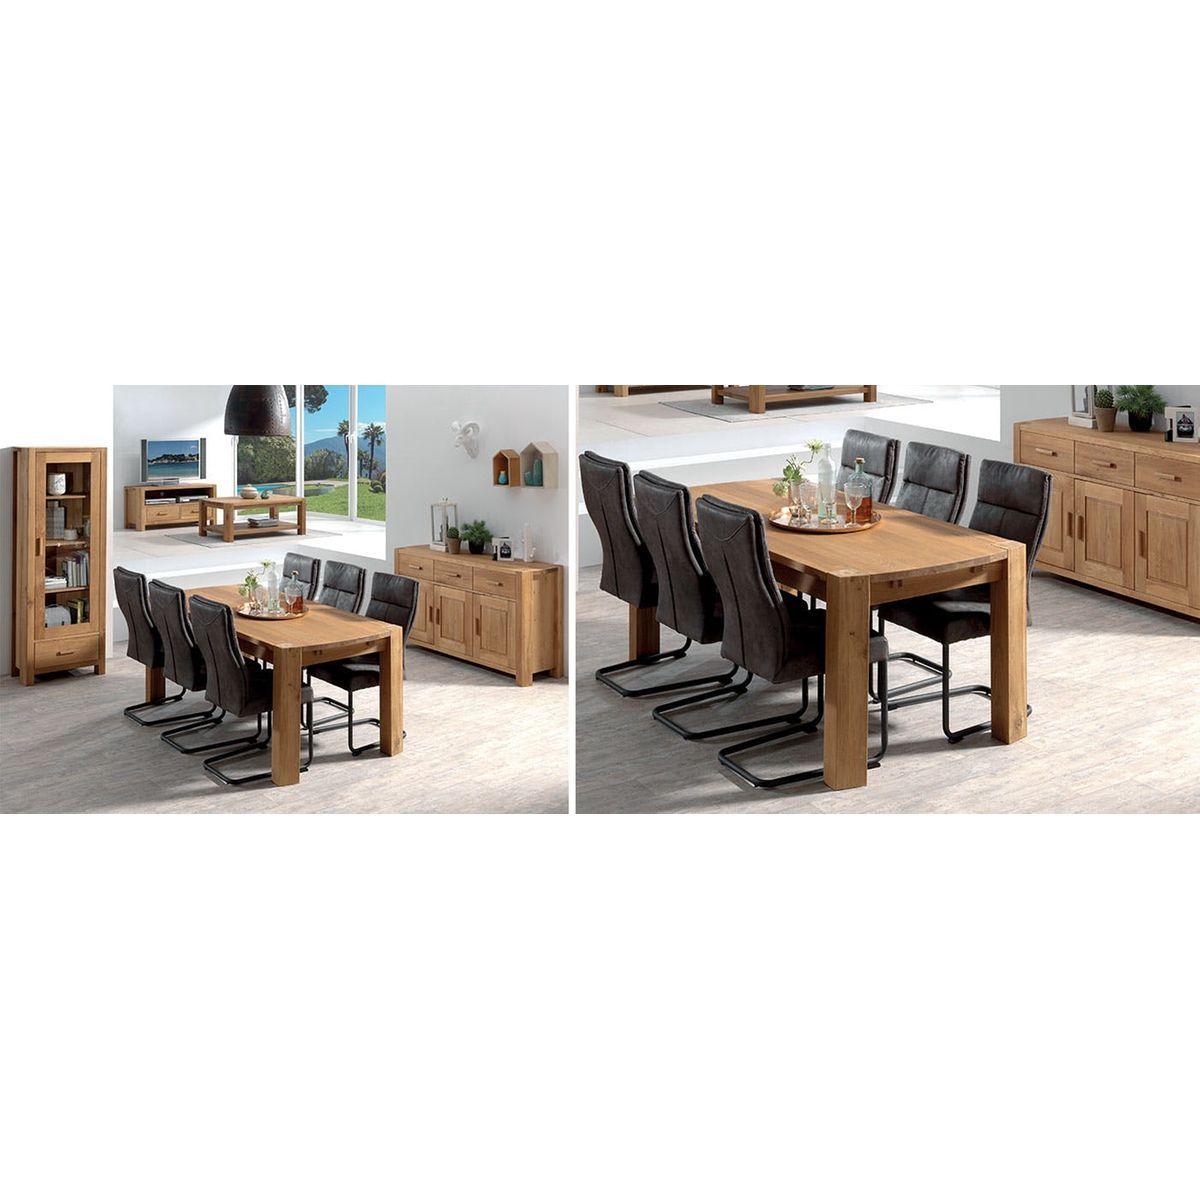 Meuble Tv Grande Taille meuble tv 2 tiroirs 1 grande niche en chêne huilé